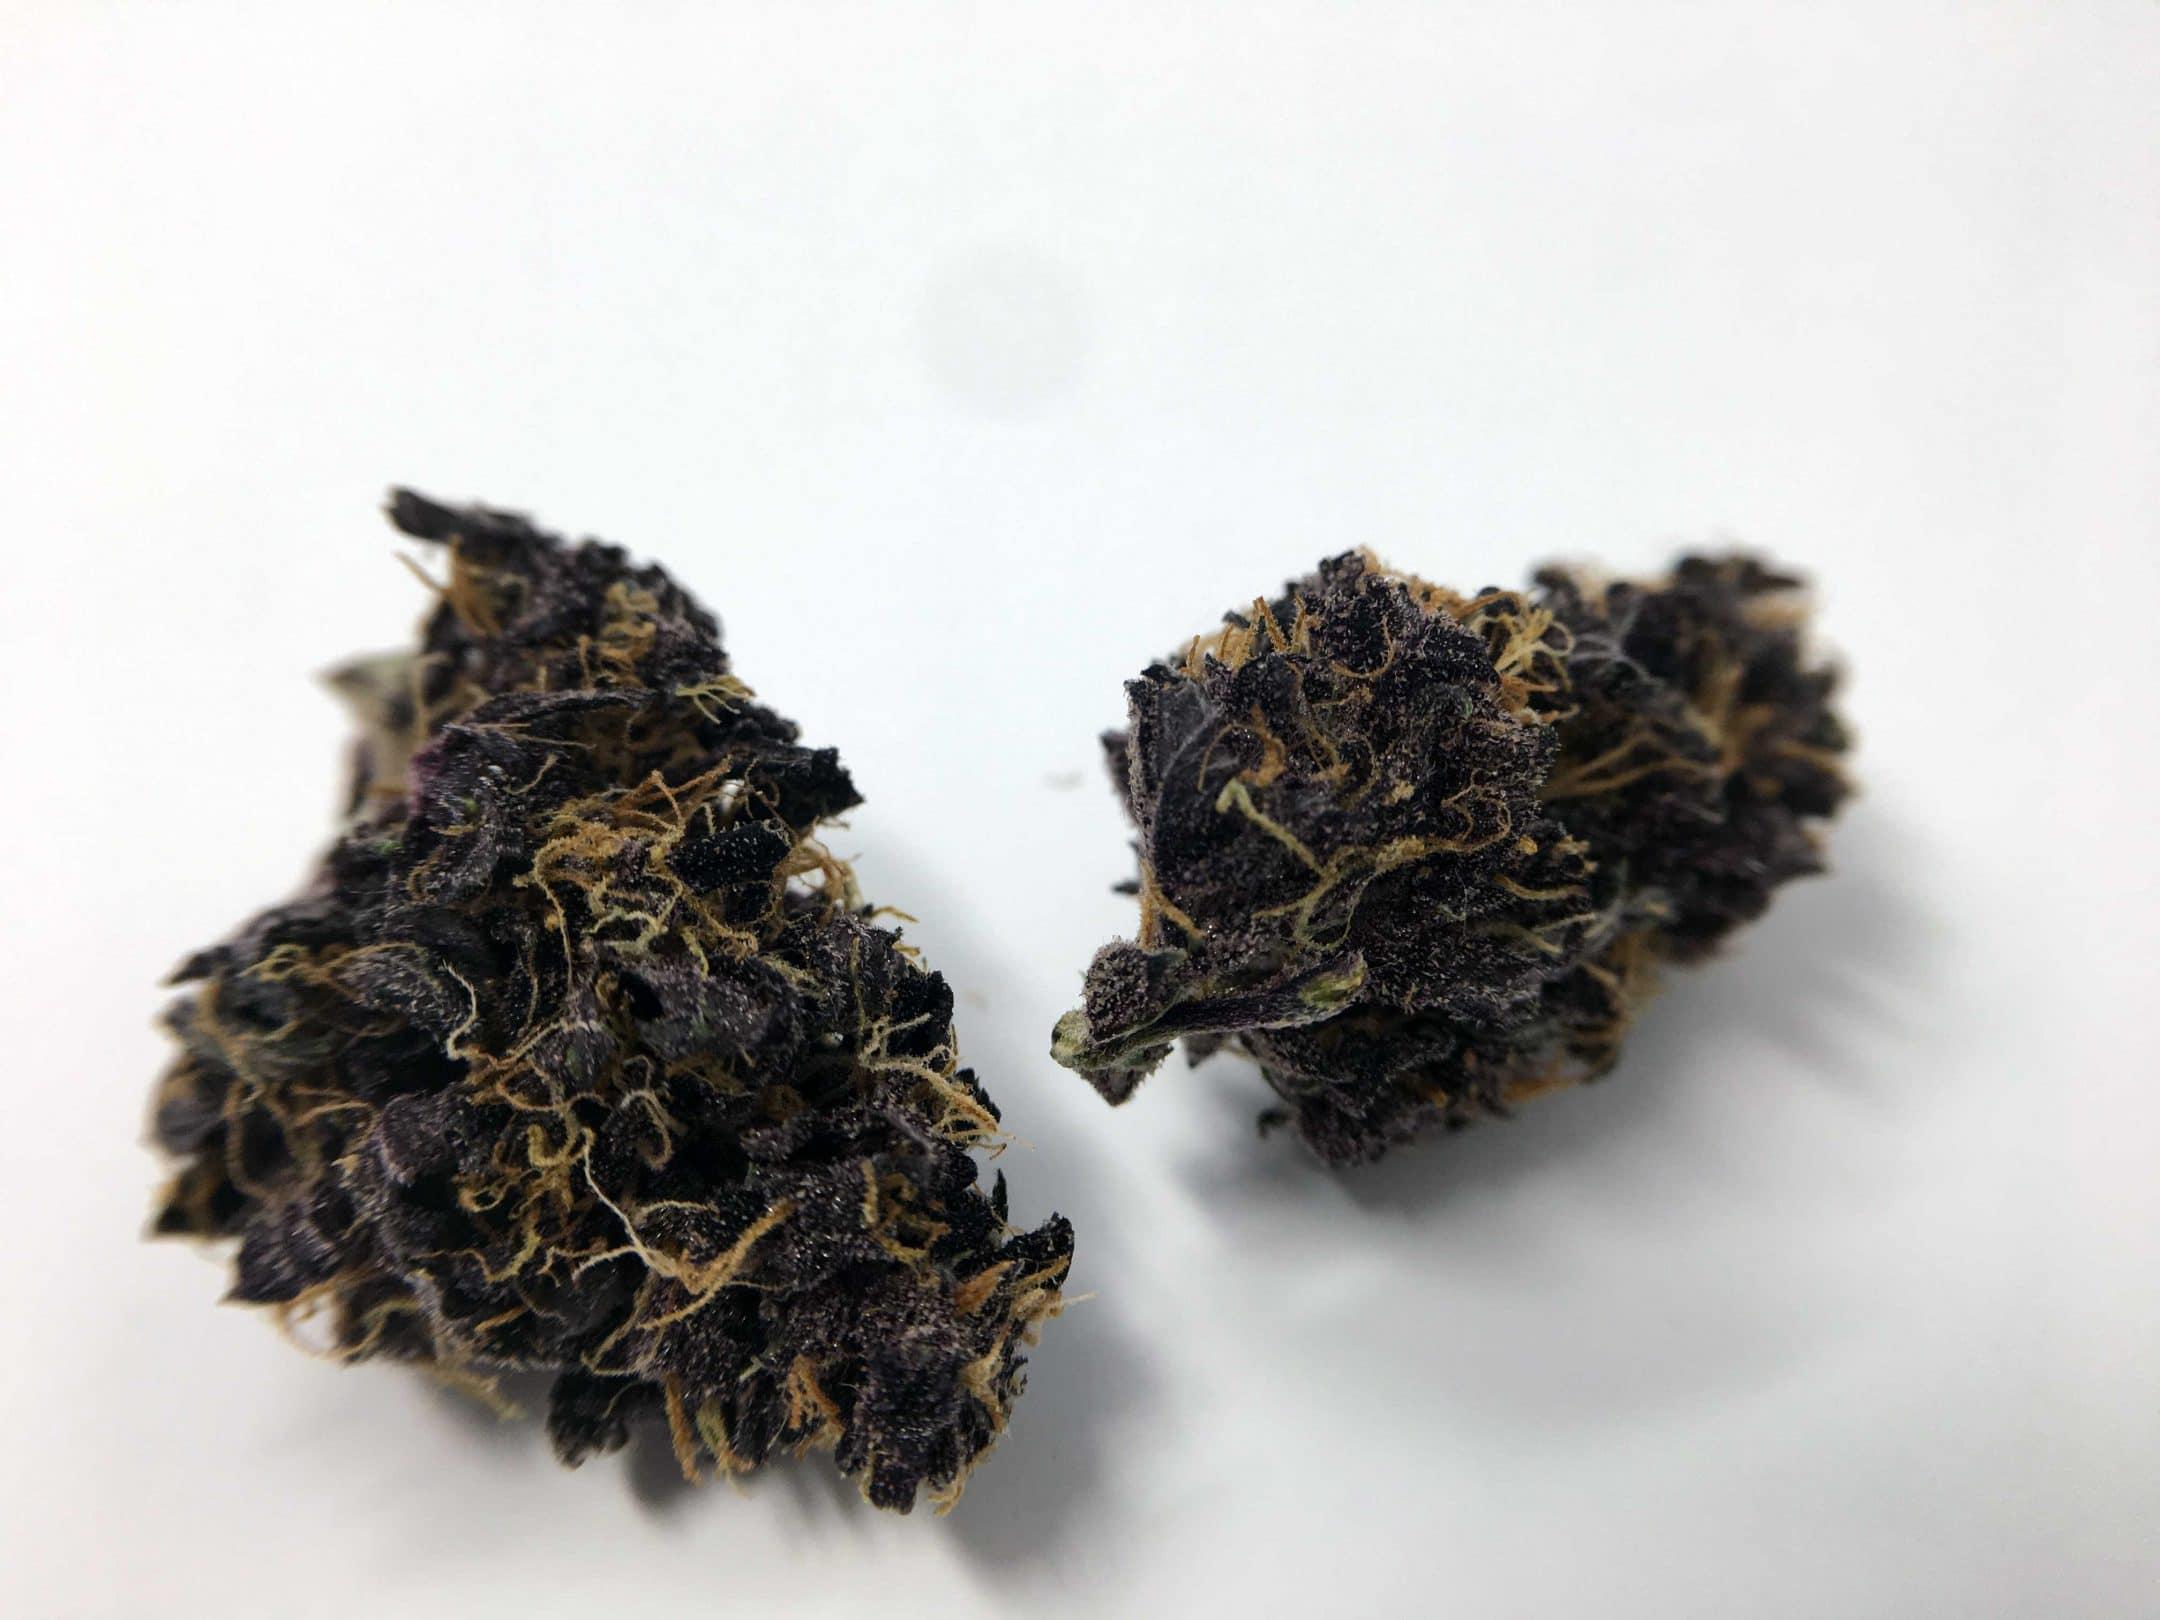 blackberry weed - photo #20